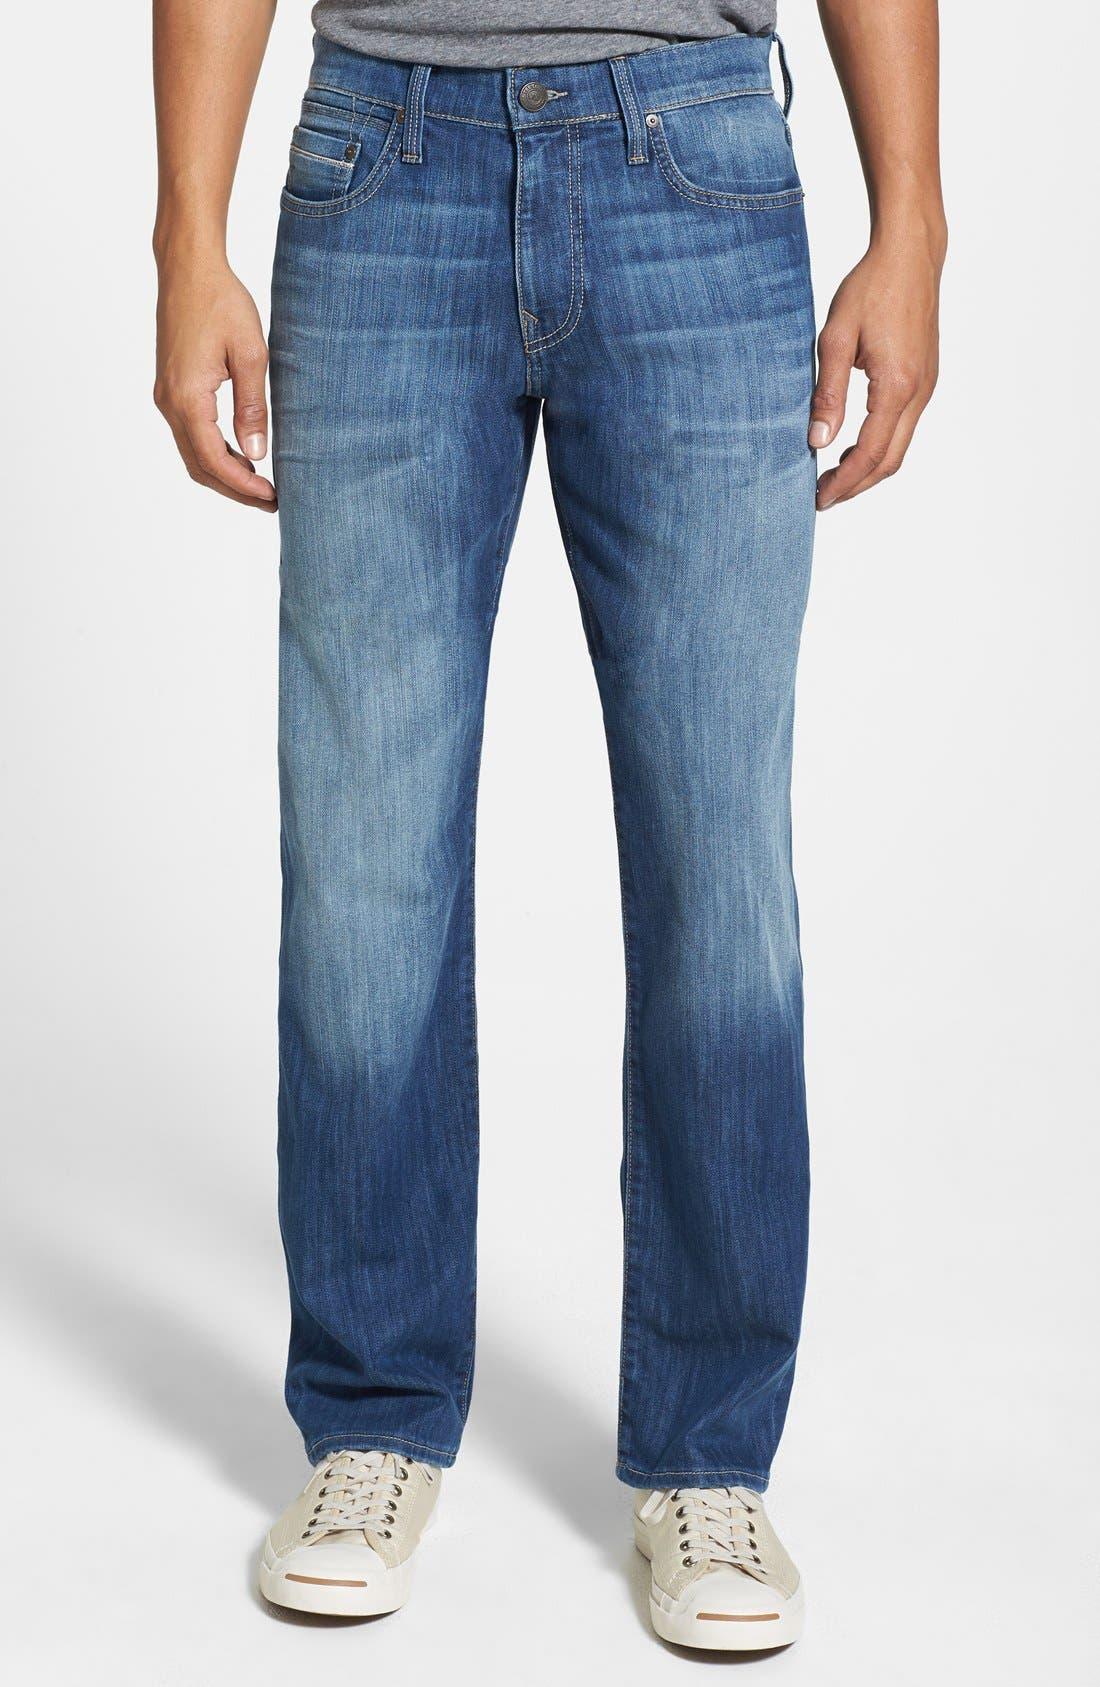 'Myles' Straight Leg Jeans,                             Main thumbnail 1, color,                             420